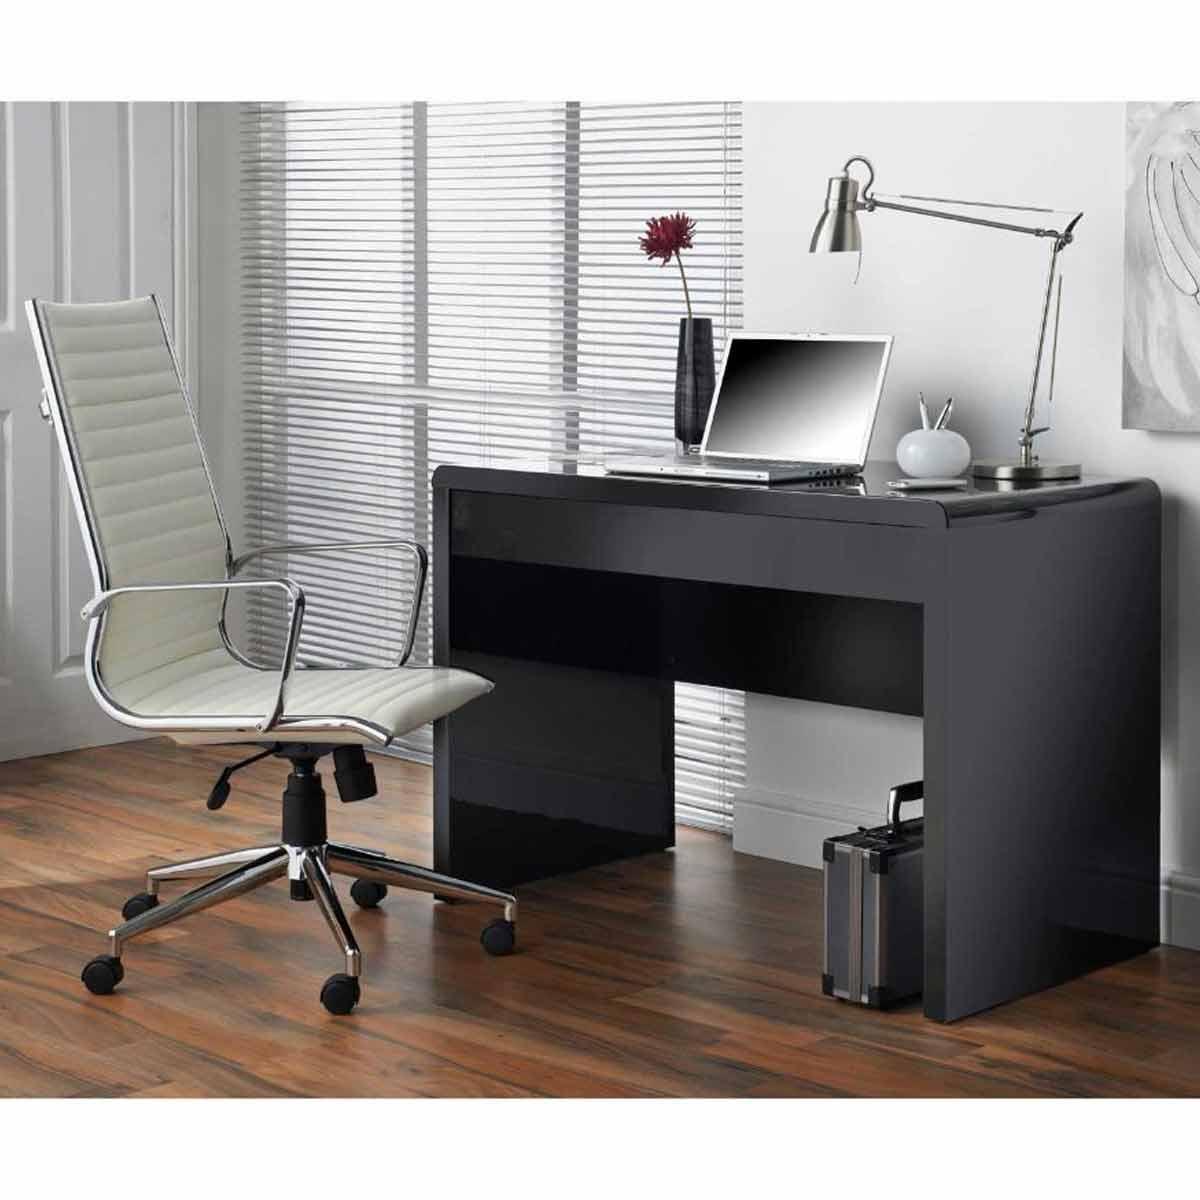 Desks Furniture  Storage  Ryman